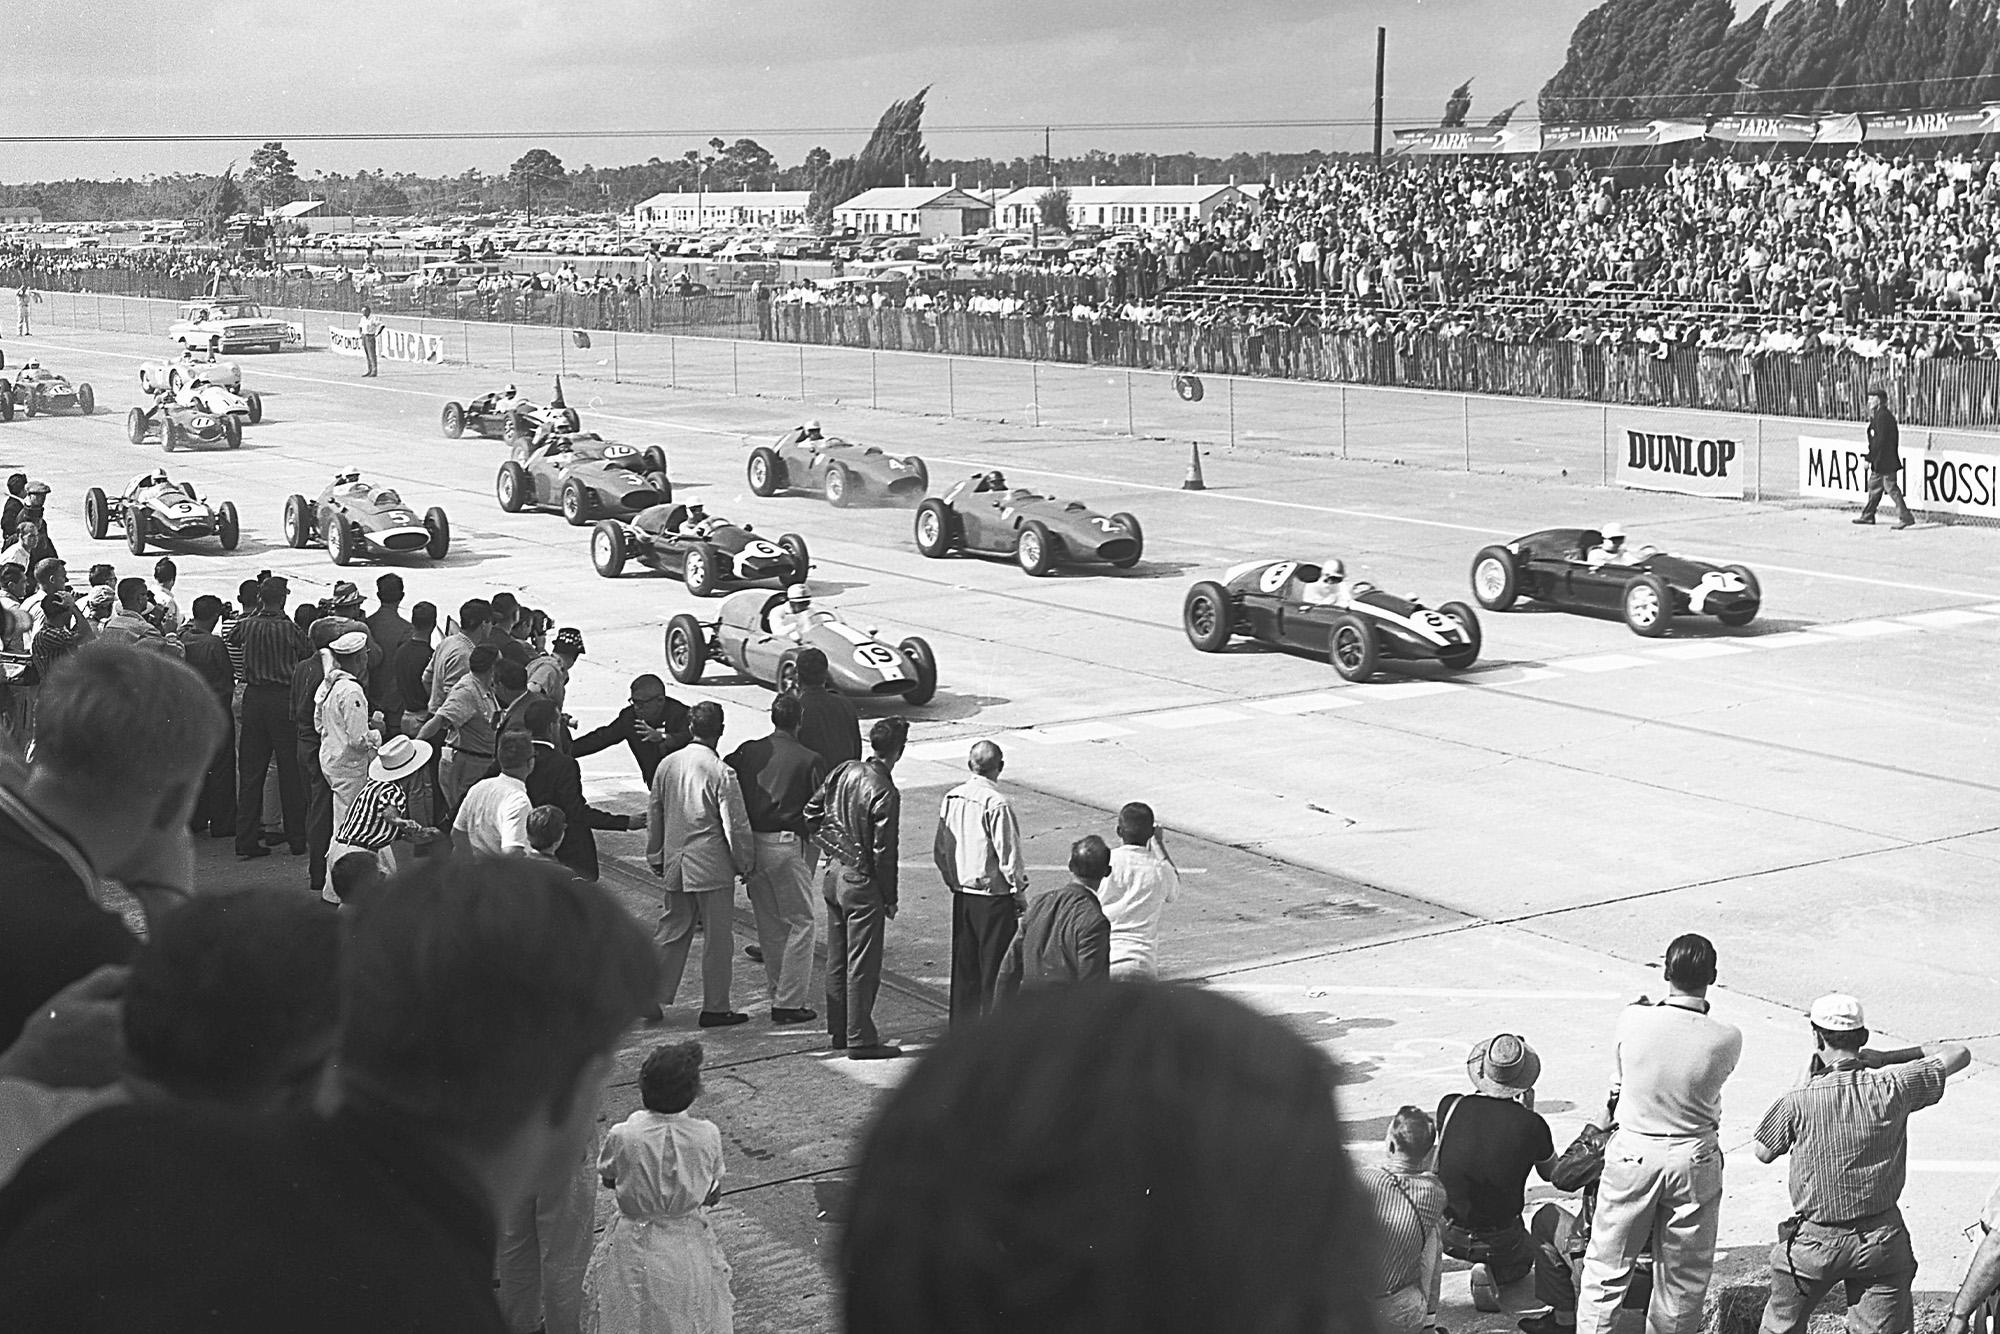 Start of the 1959 United States Grand Prix at Sebring